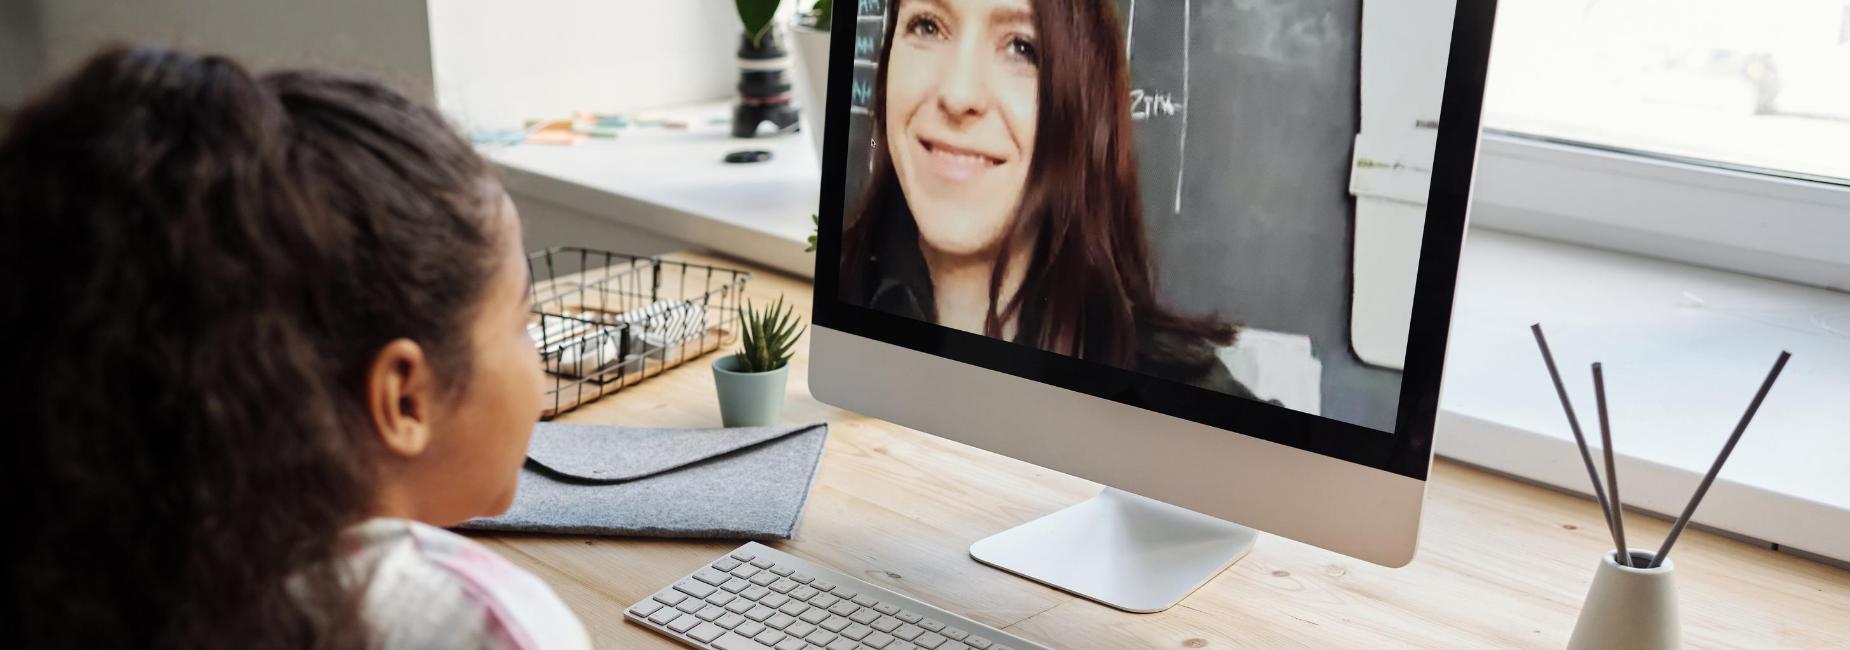 girl smiling at woman on computer monitor